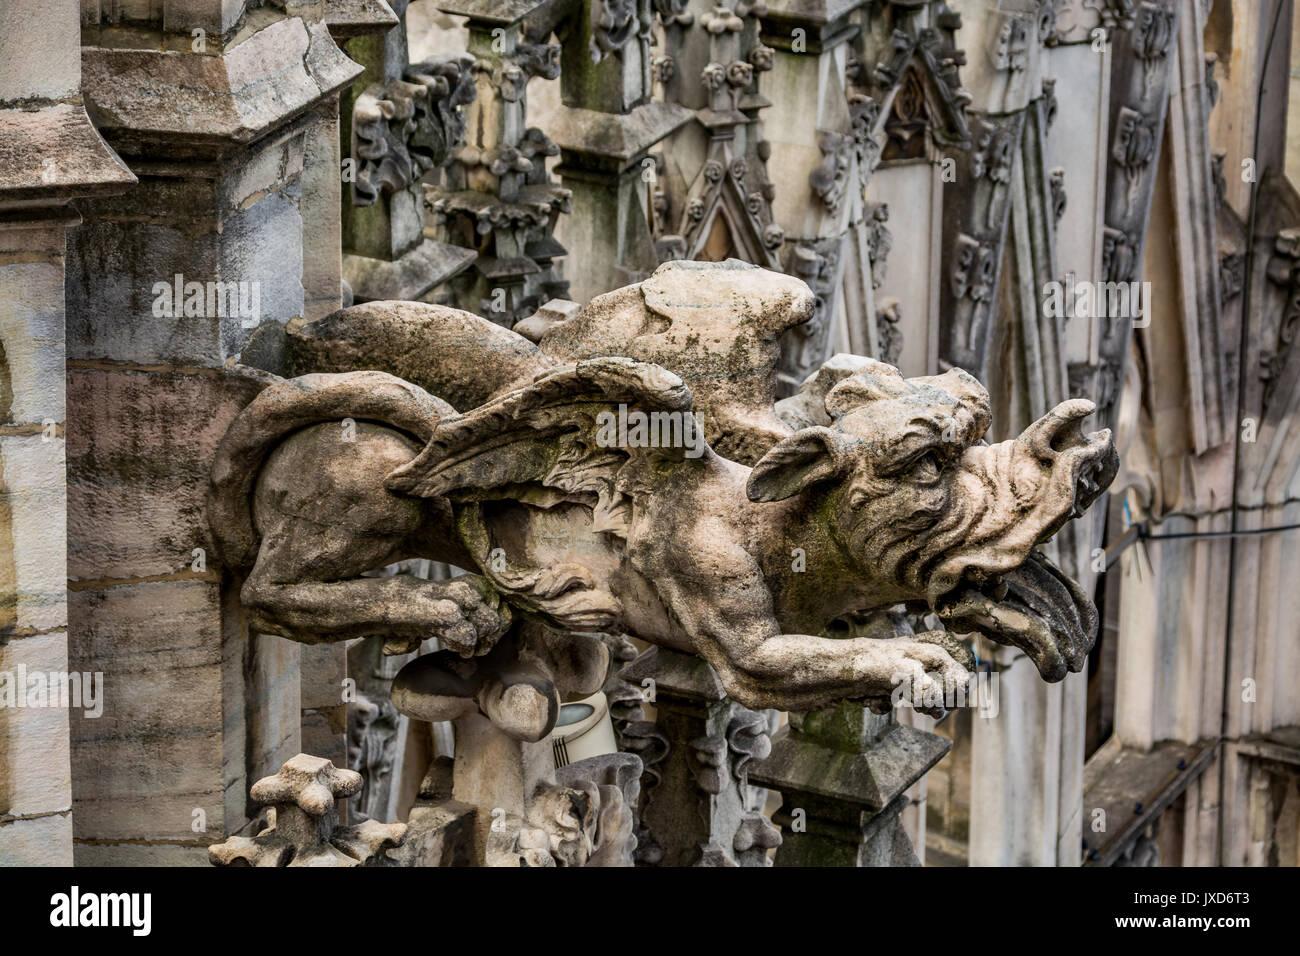 Architectural detail - gargoyle of the Milan Cathedral - Duomo di Milano, Italy - Stock Image